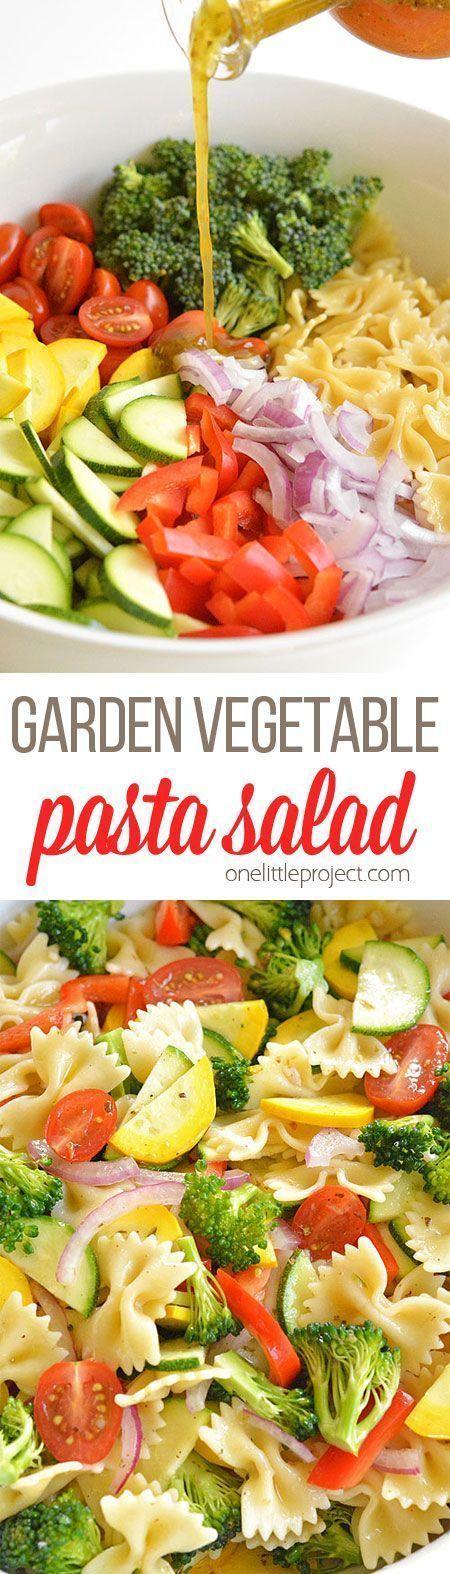 This garden vegetable pasta salad recipe is sooooooooo good! It uses all fresh summer ingredients that combine to give